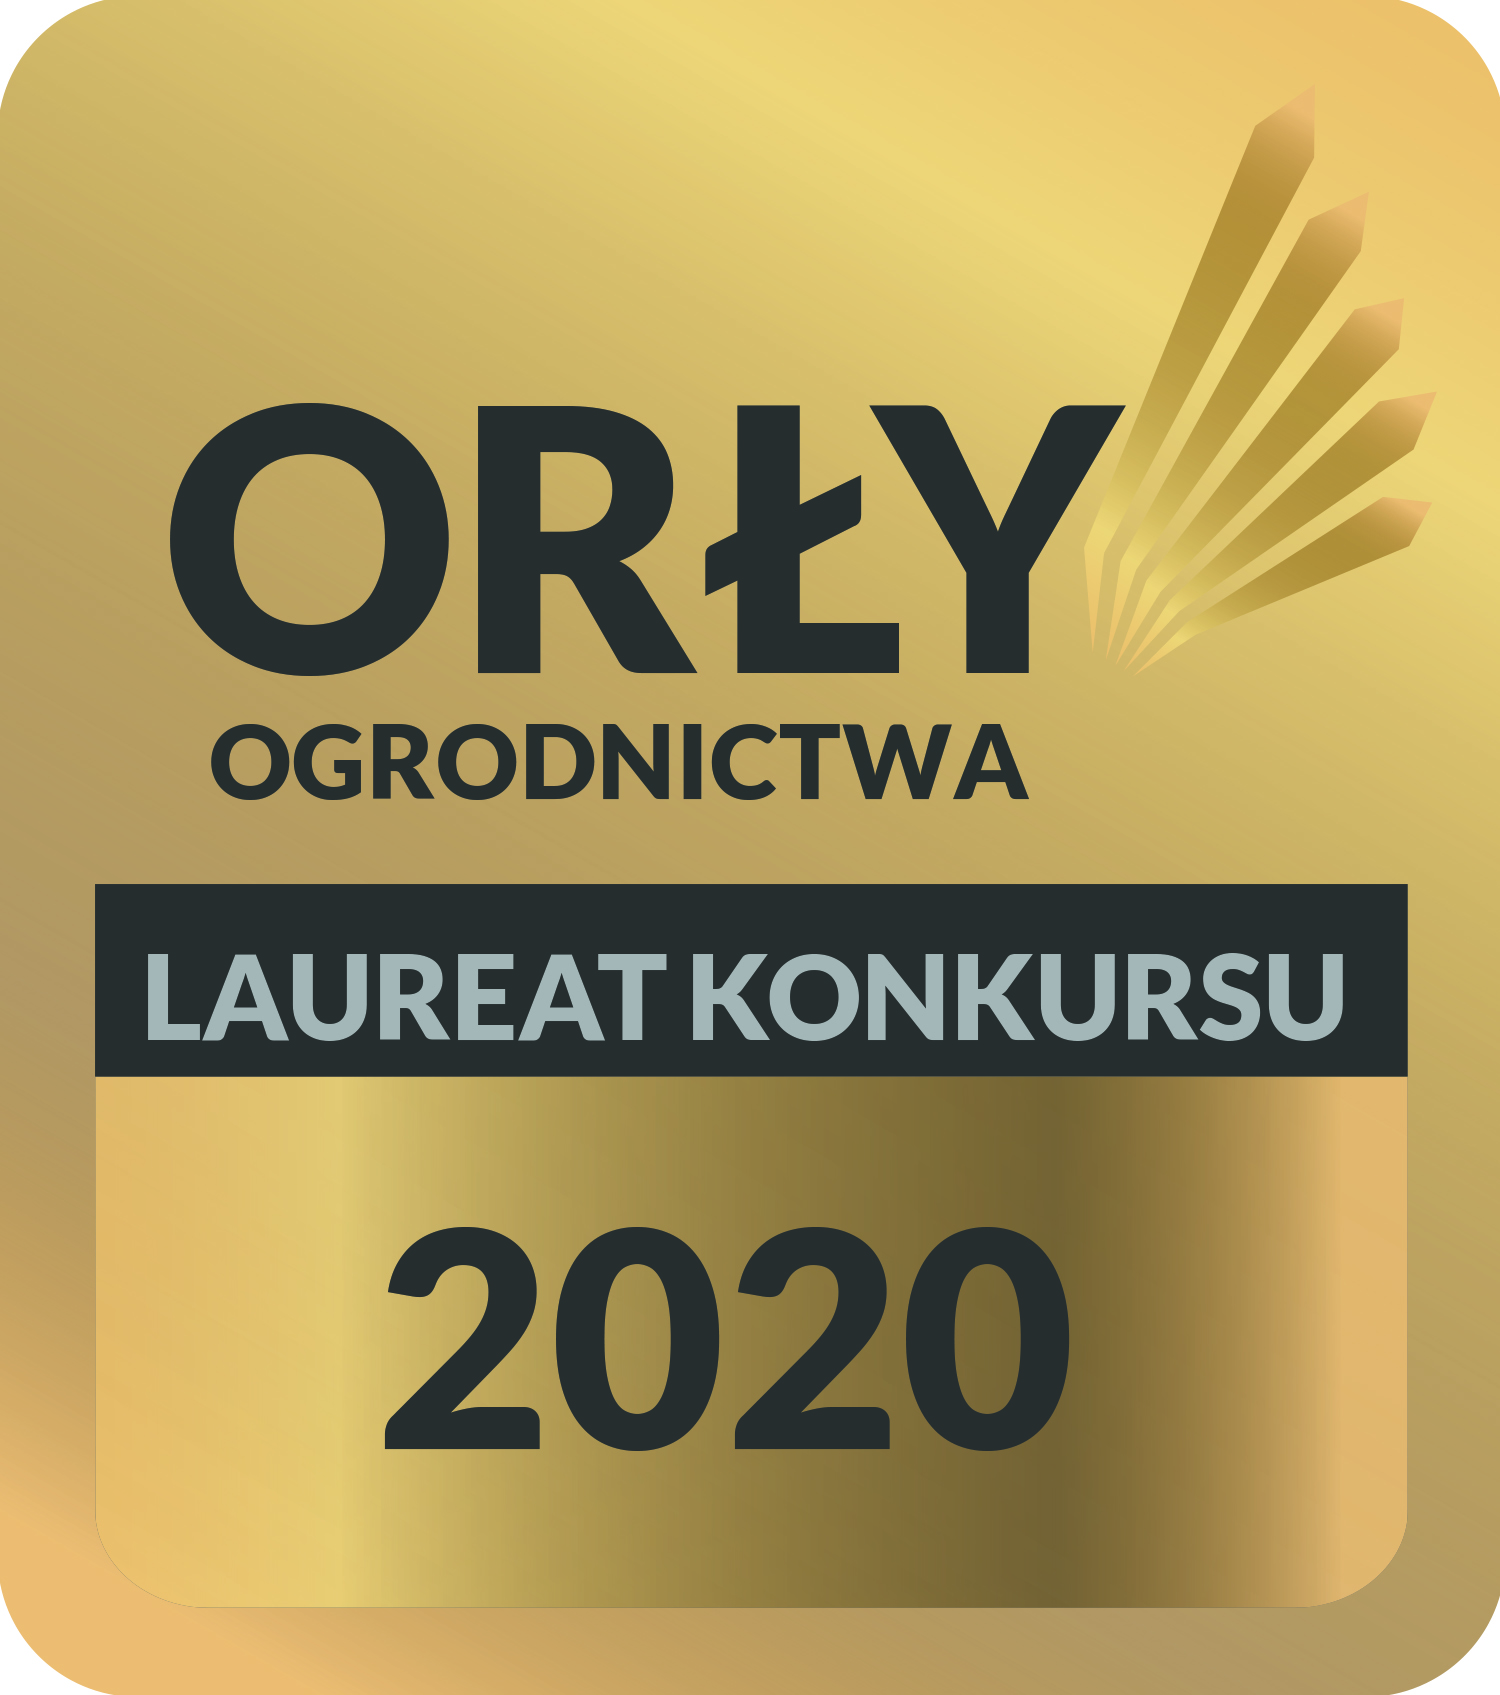 ogrodnictwa logo 2020 1500.jpg